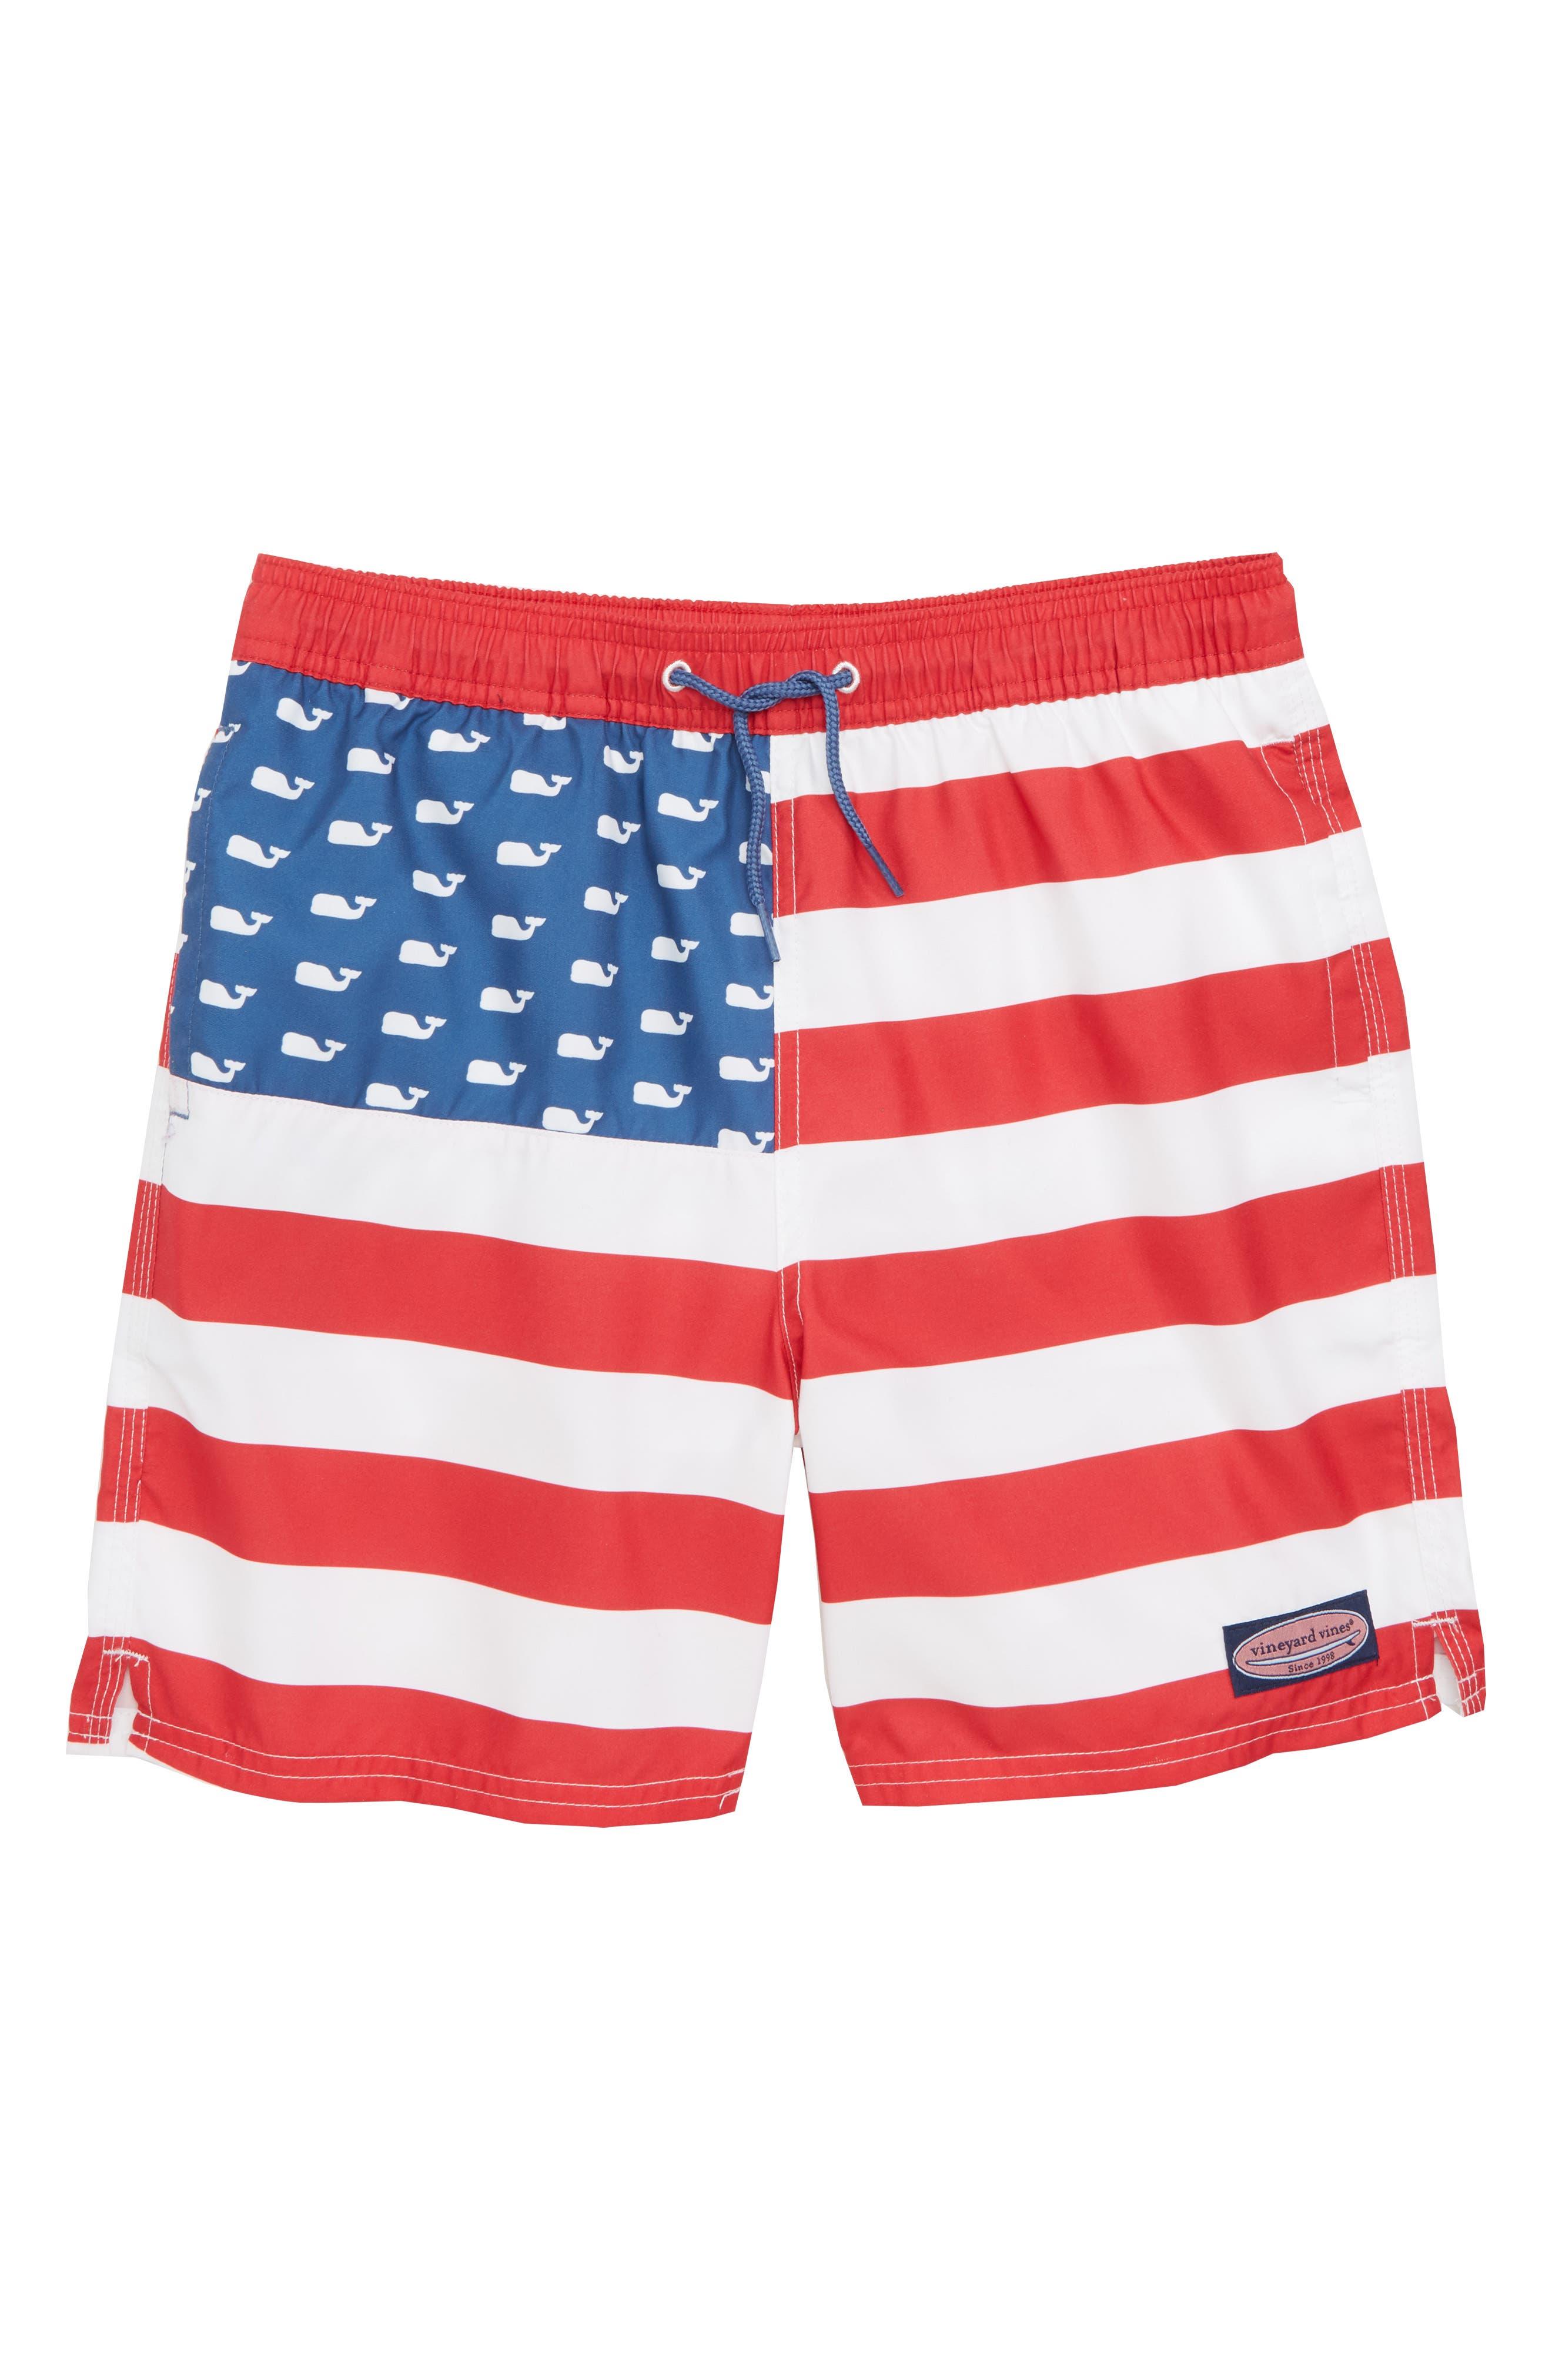 vineyard vines Chappy USA Flag Swim Trunks (Little Boys & Big Boys)